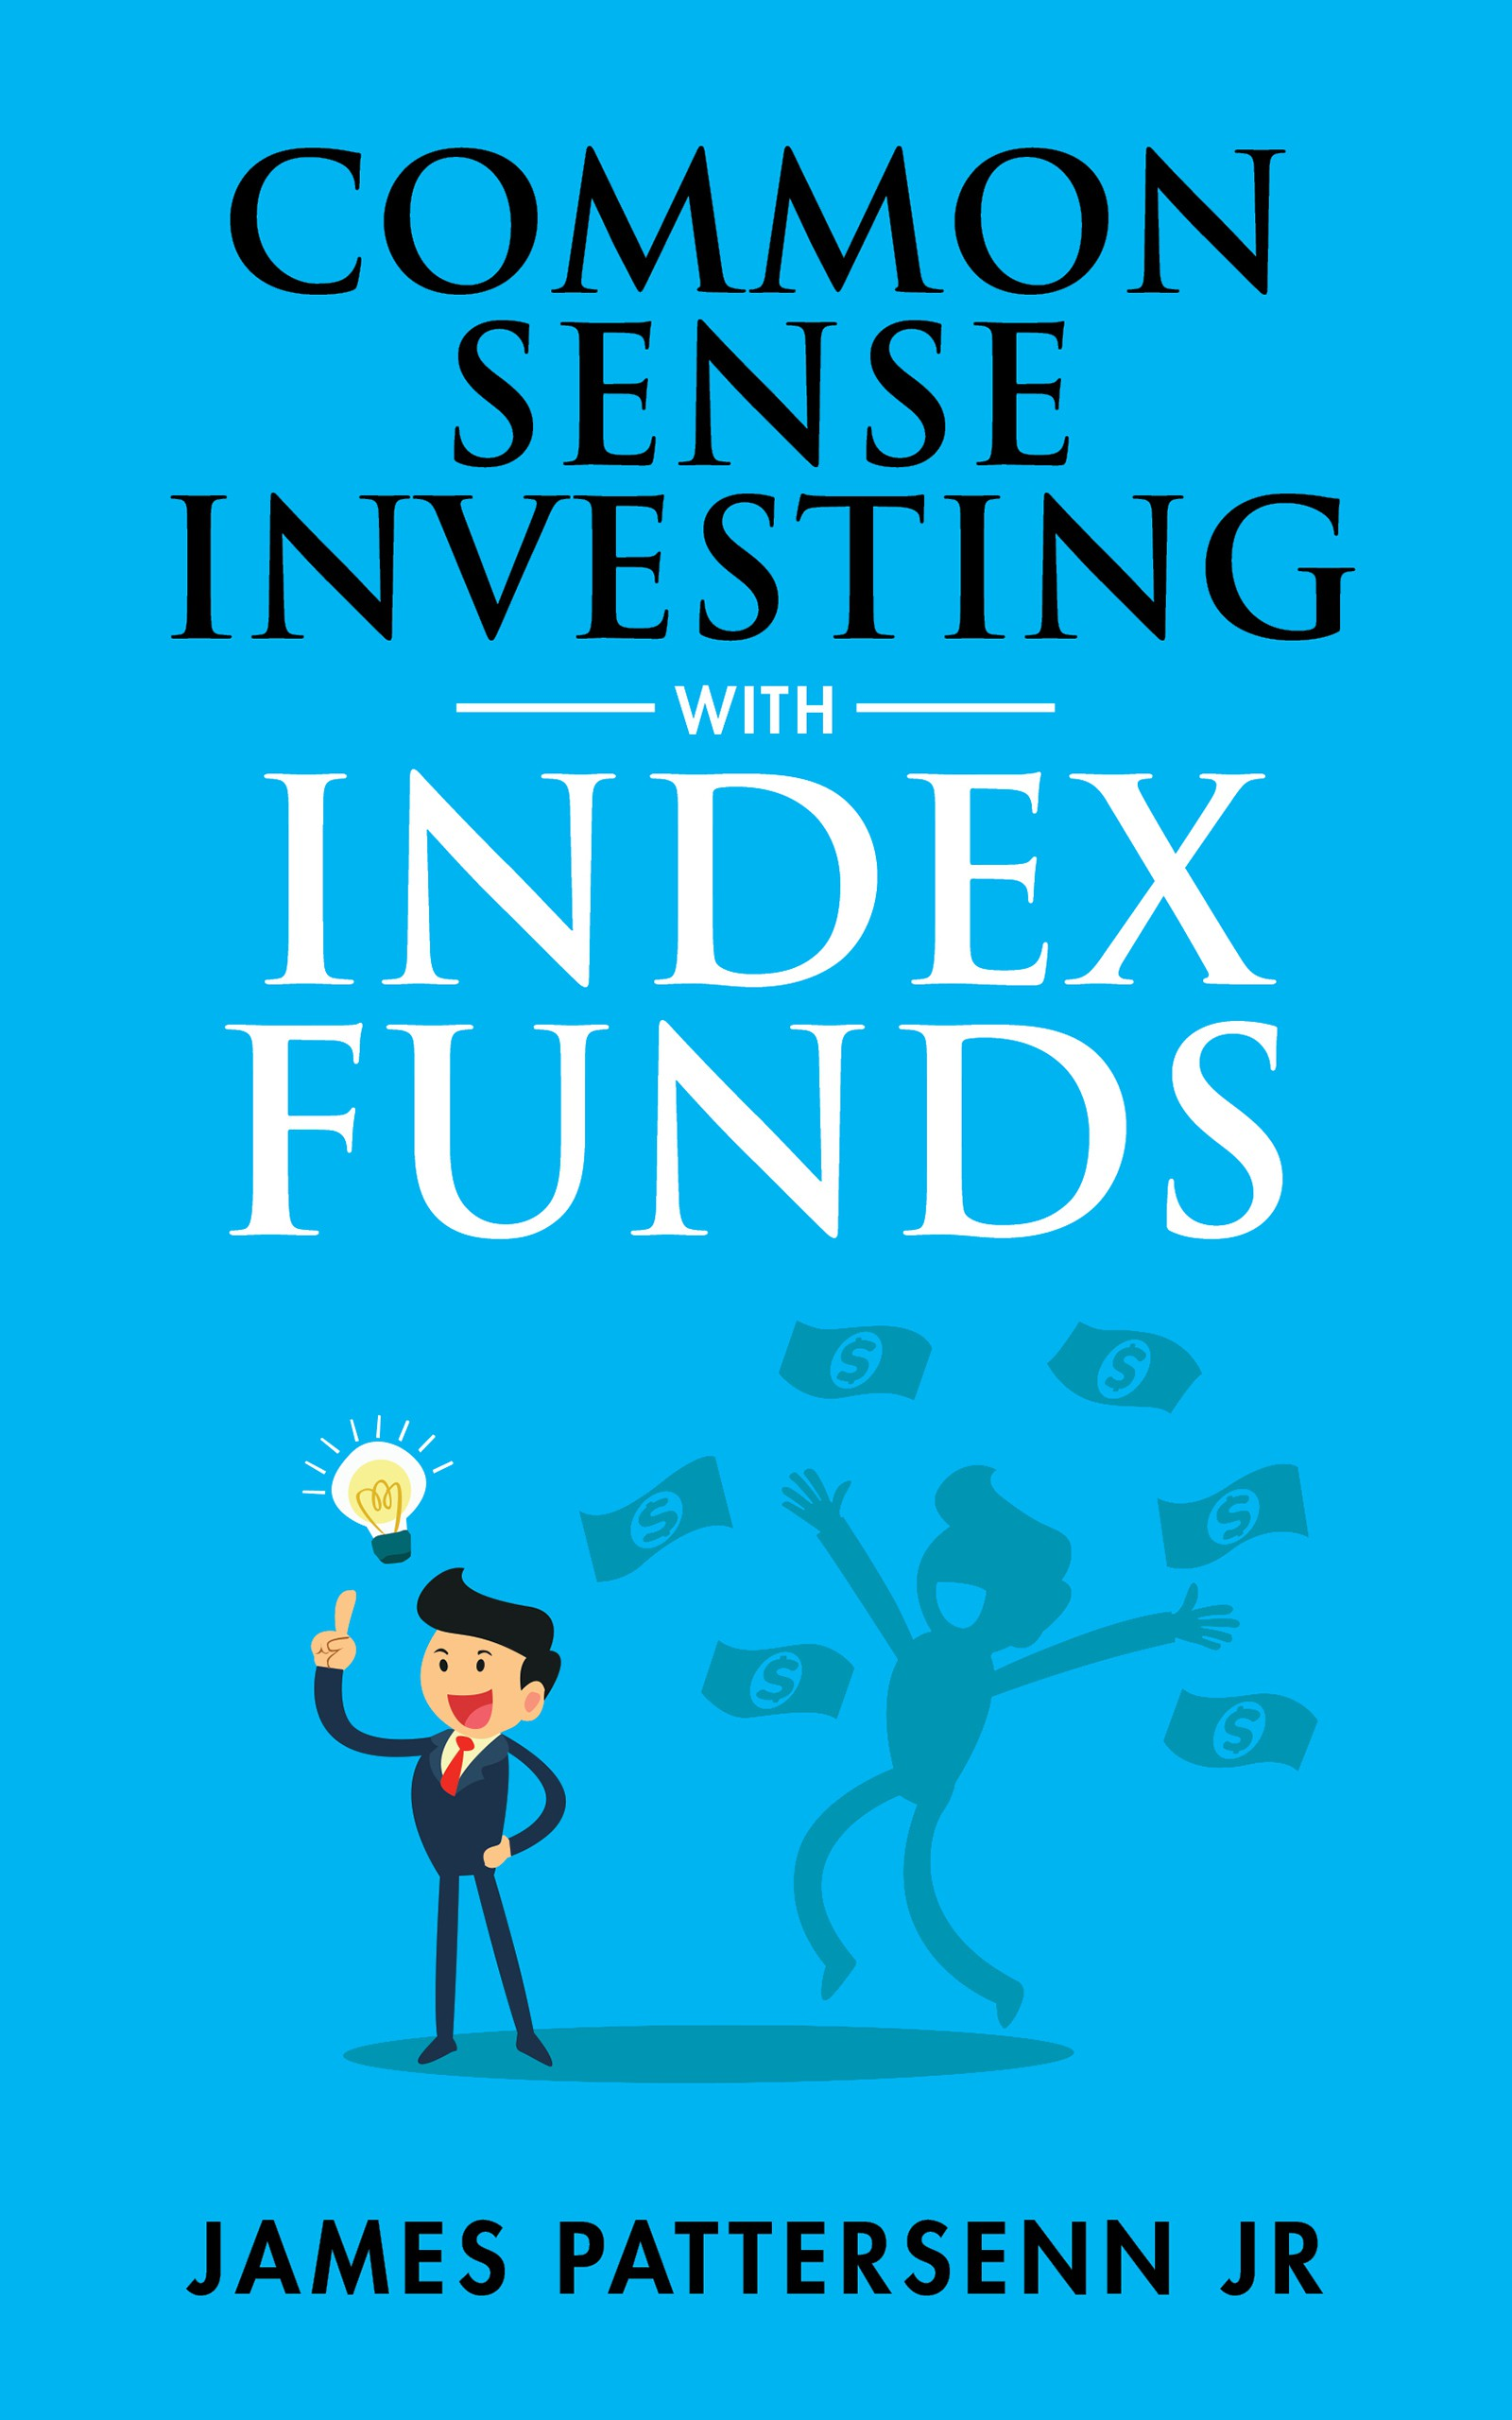 Index Funds Investing Cover Design